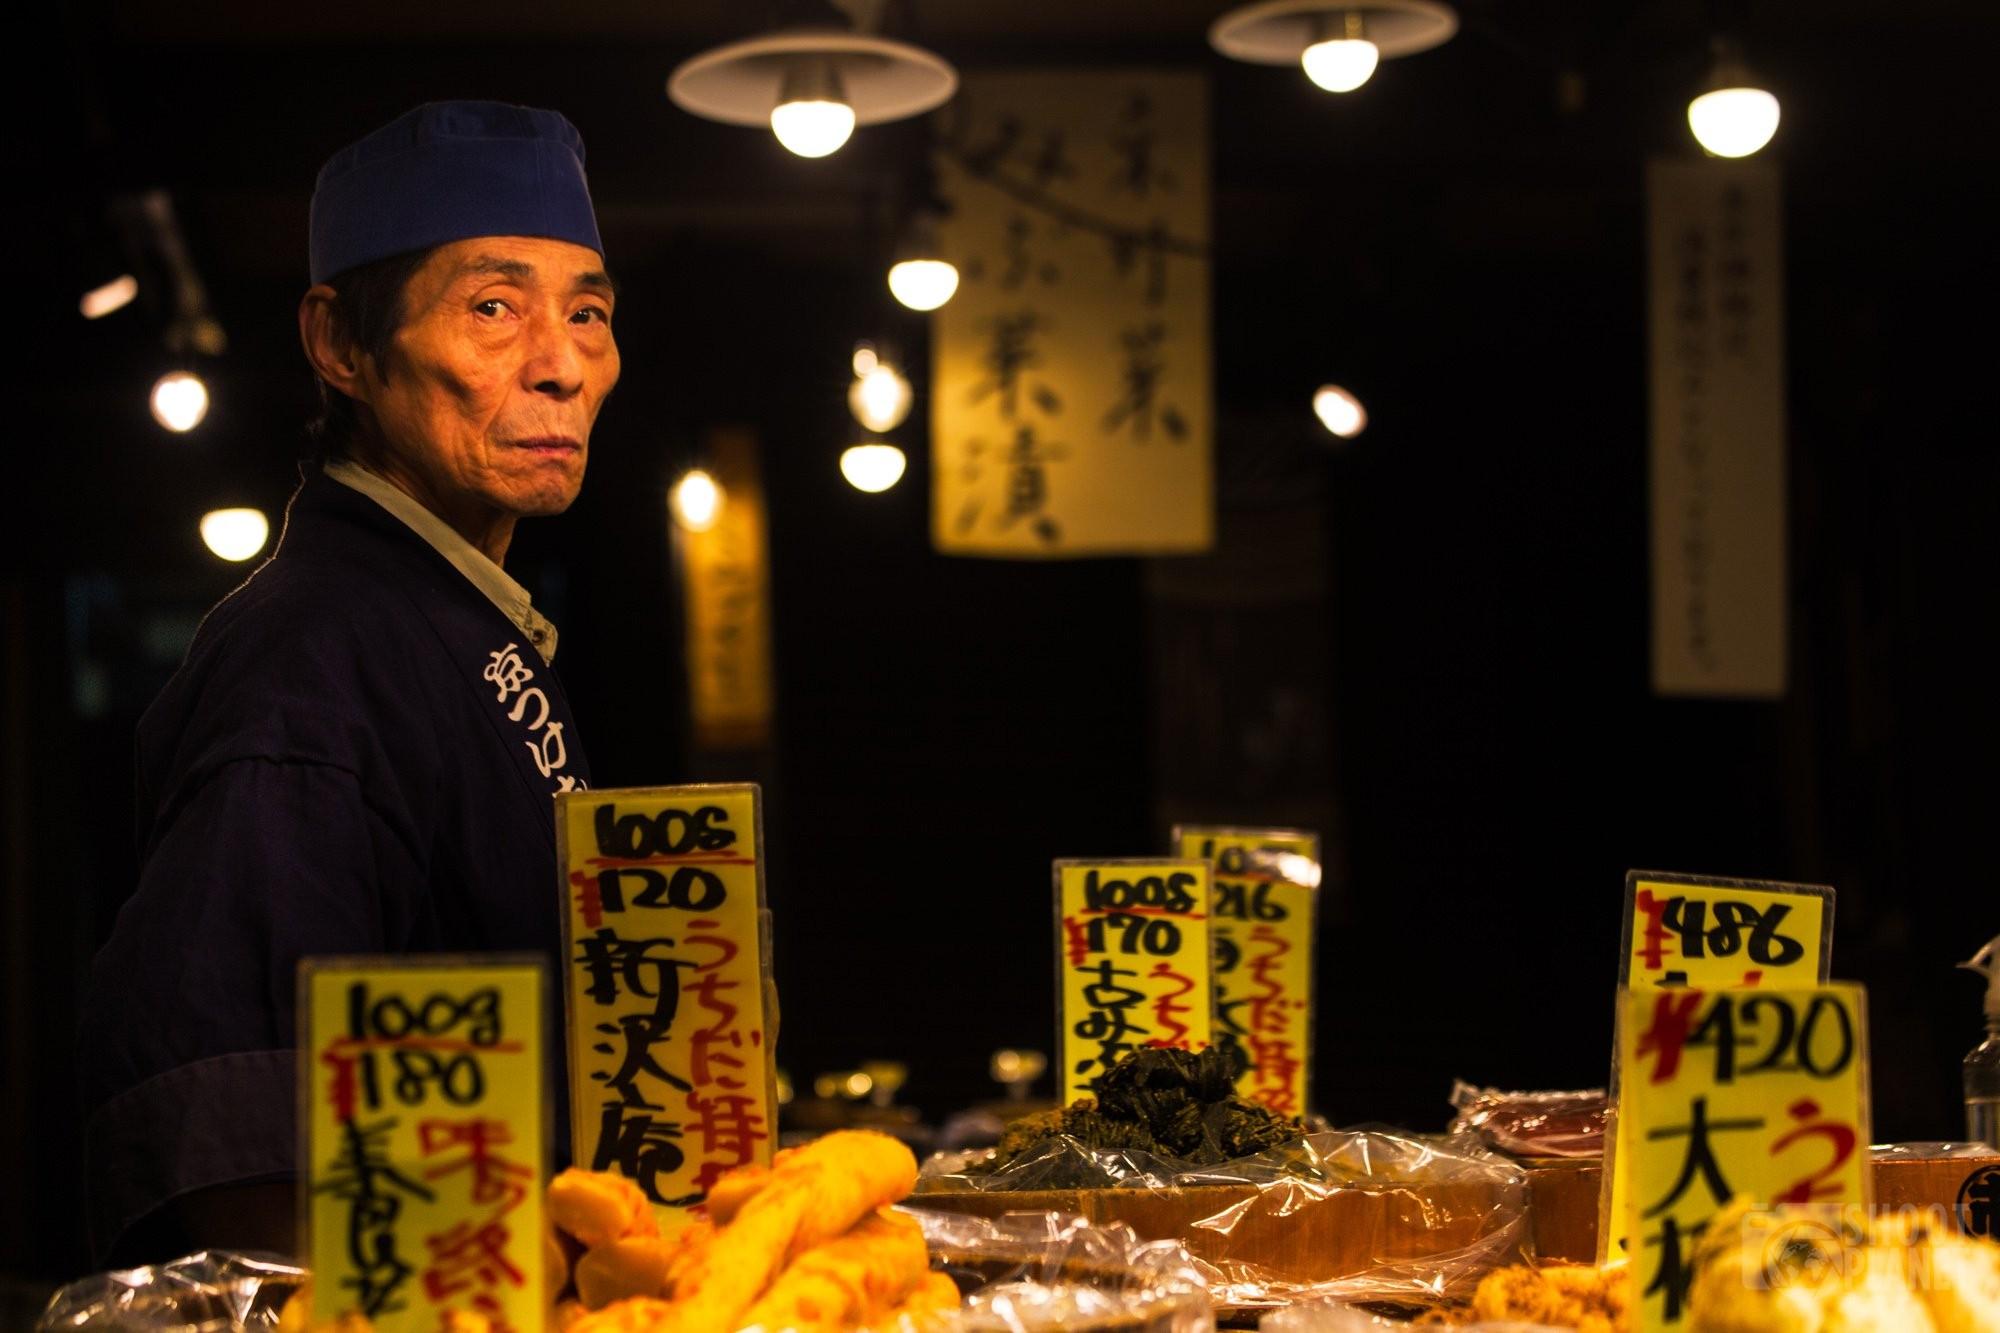 Japanese shop salesman in Nishiki Market, Kyoto